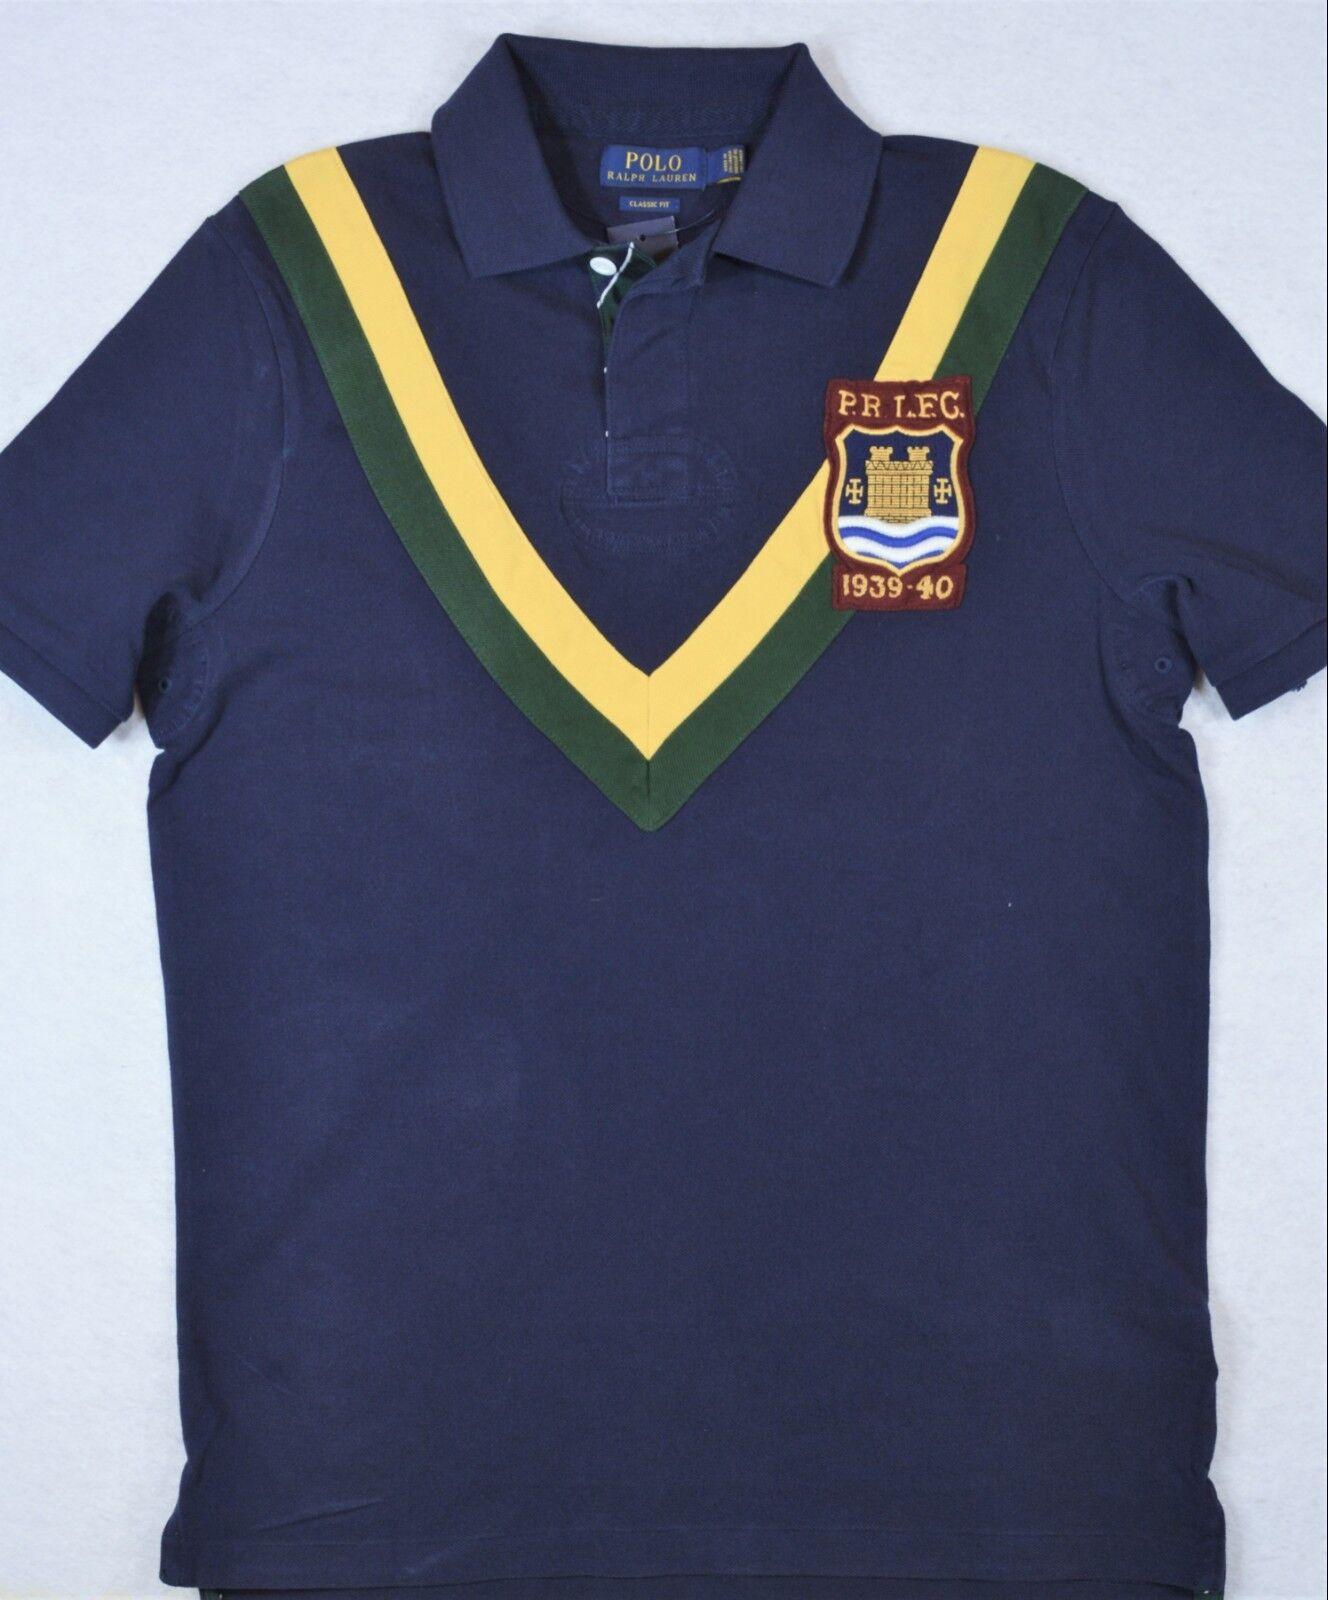 Polo Ralph Lauren Rugby Crest Mesh Shirt L & XL NWT